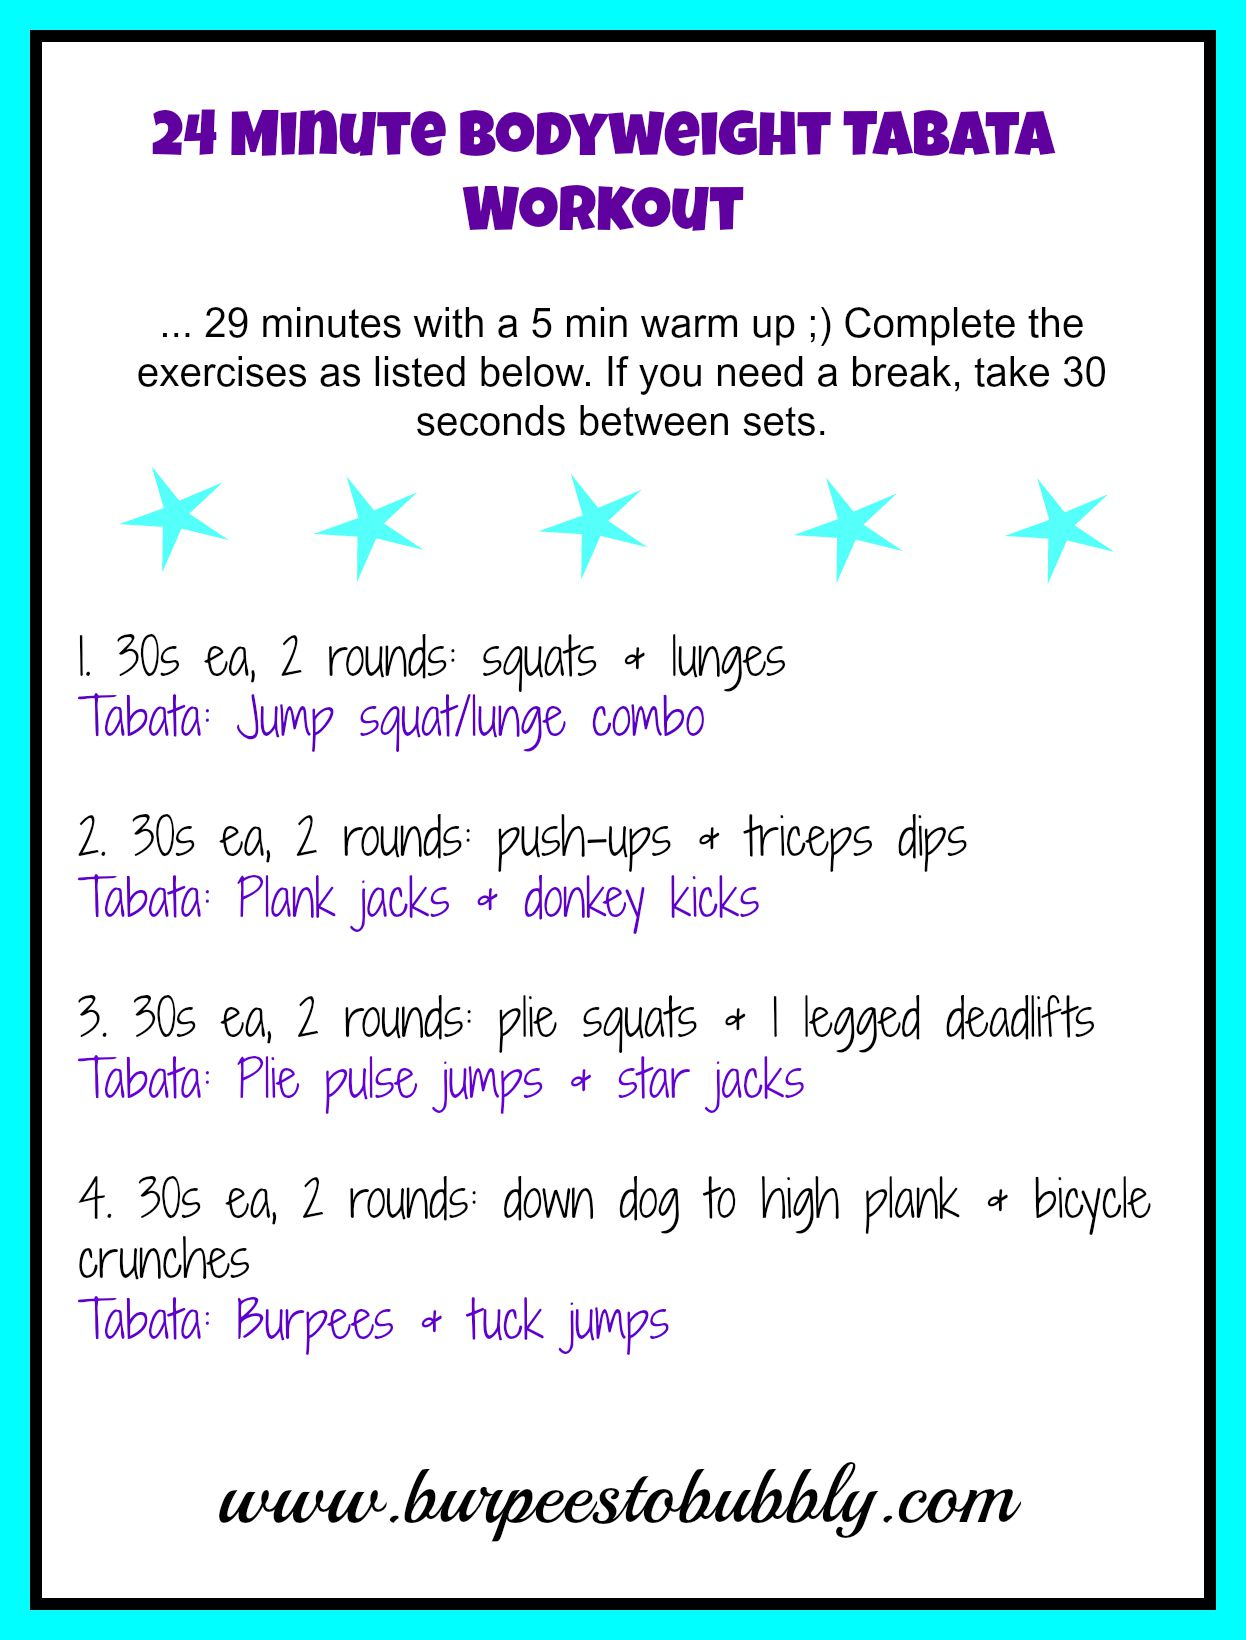 Wednesday Workout: 24 Minute Bodyweight Tabata Workout